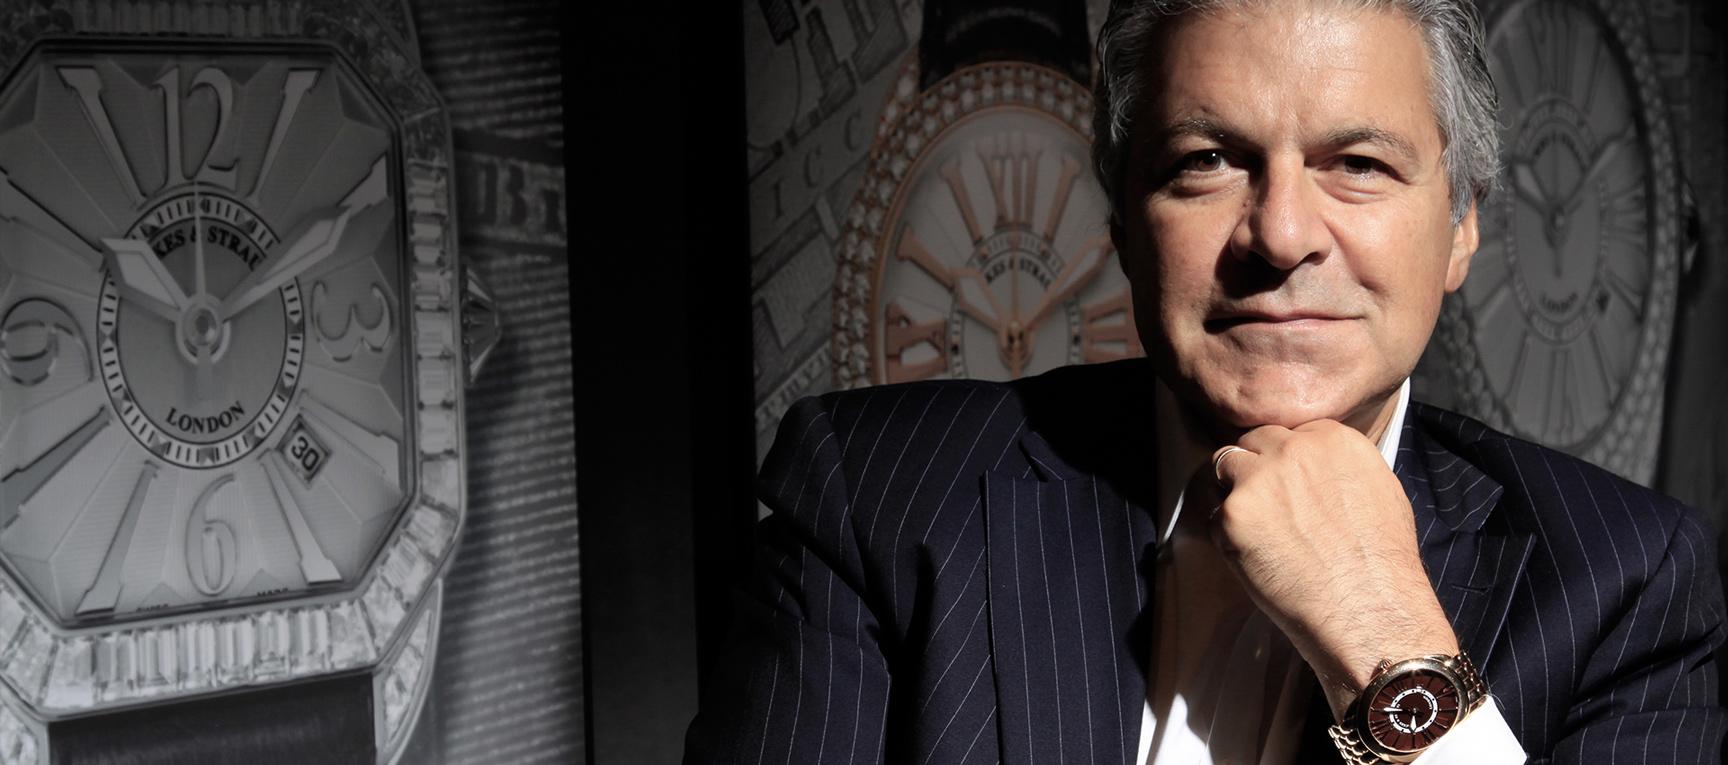 Backes & Strauss watch house CEO Vartkess Knadjian